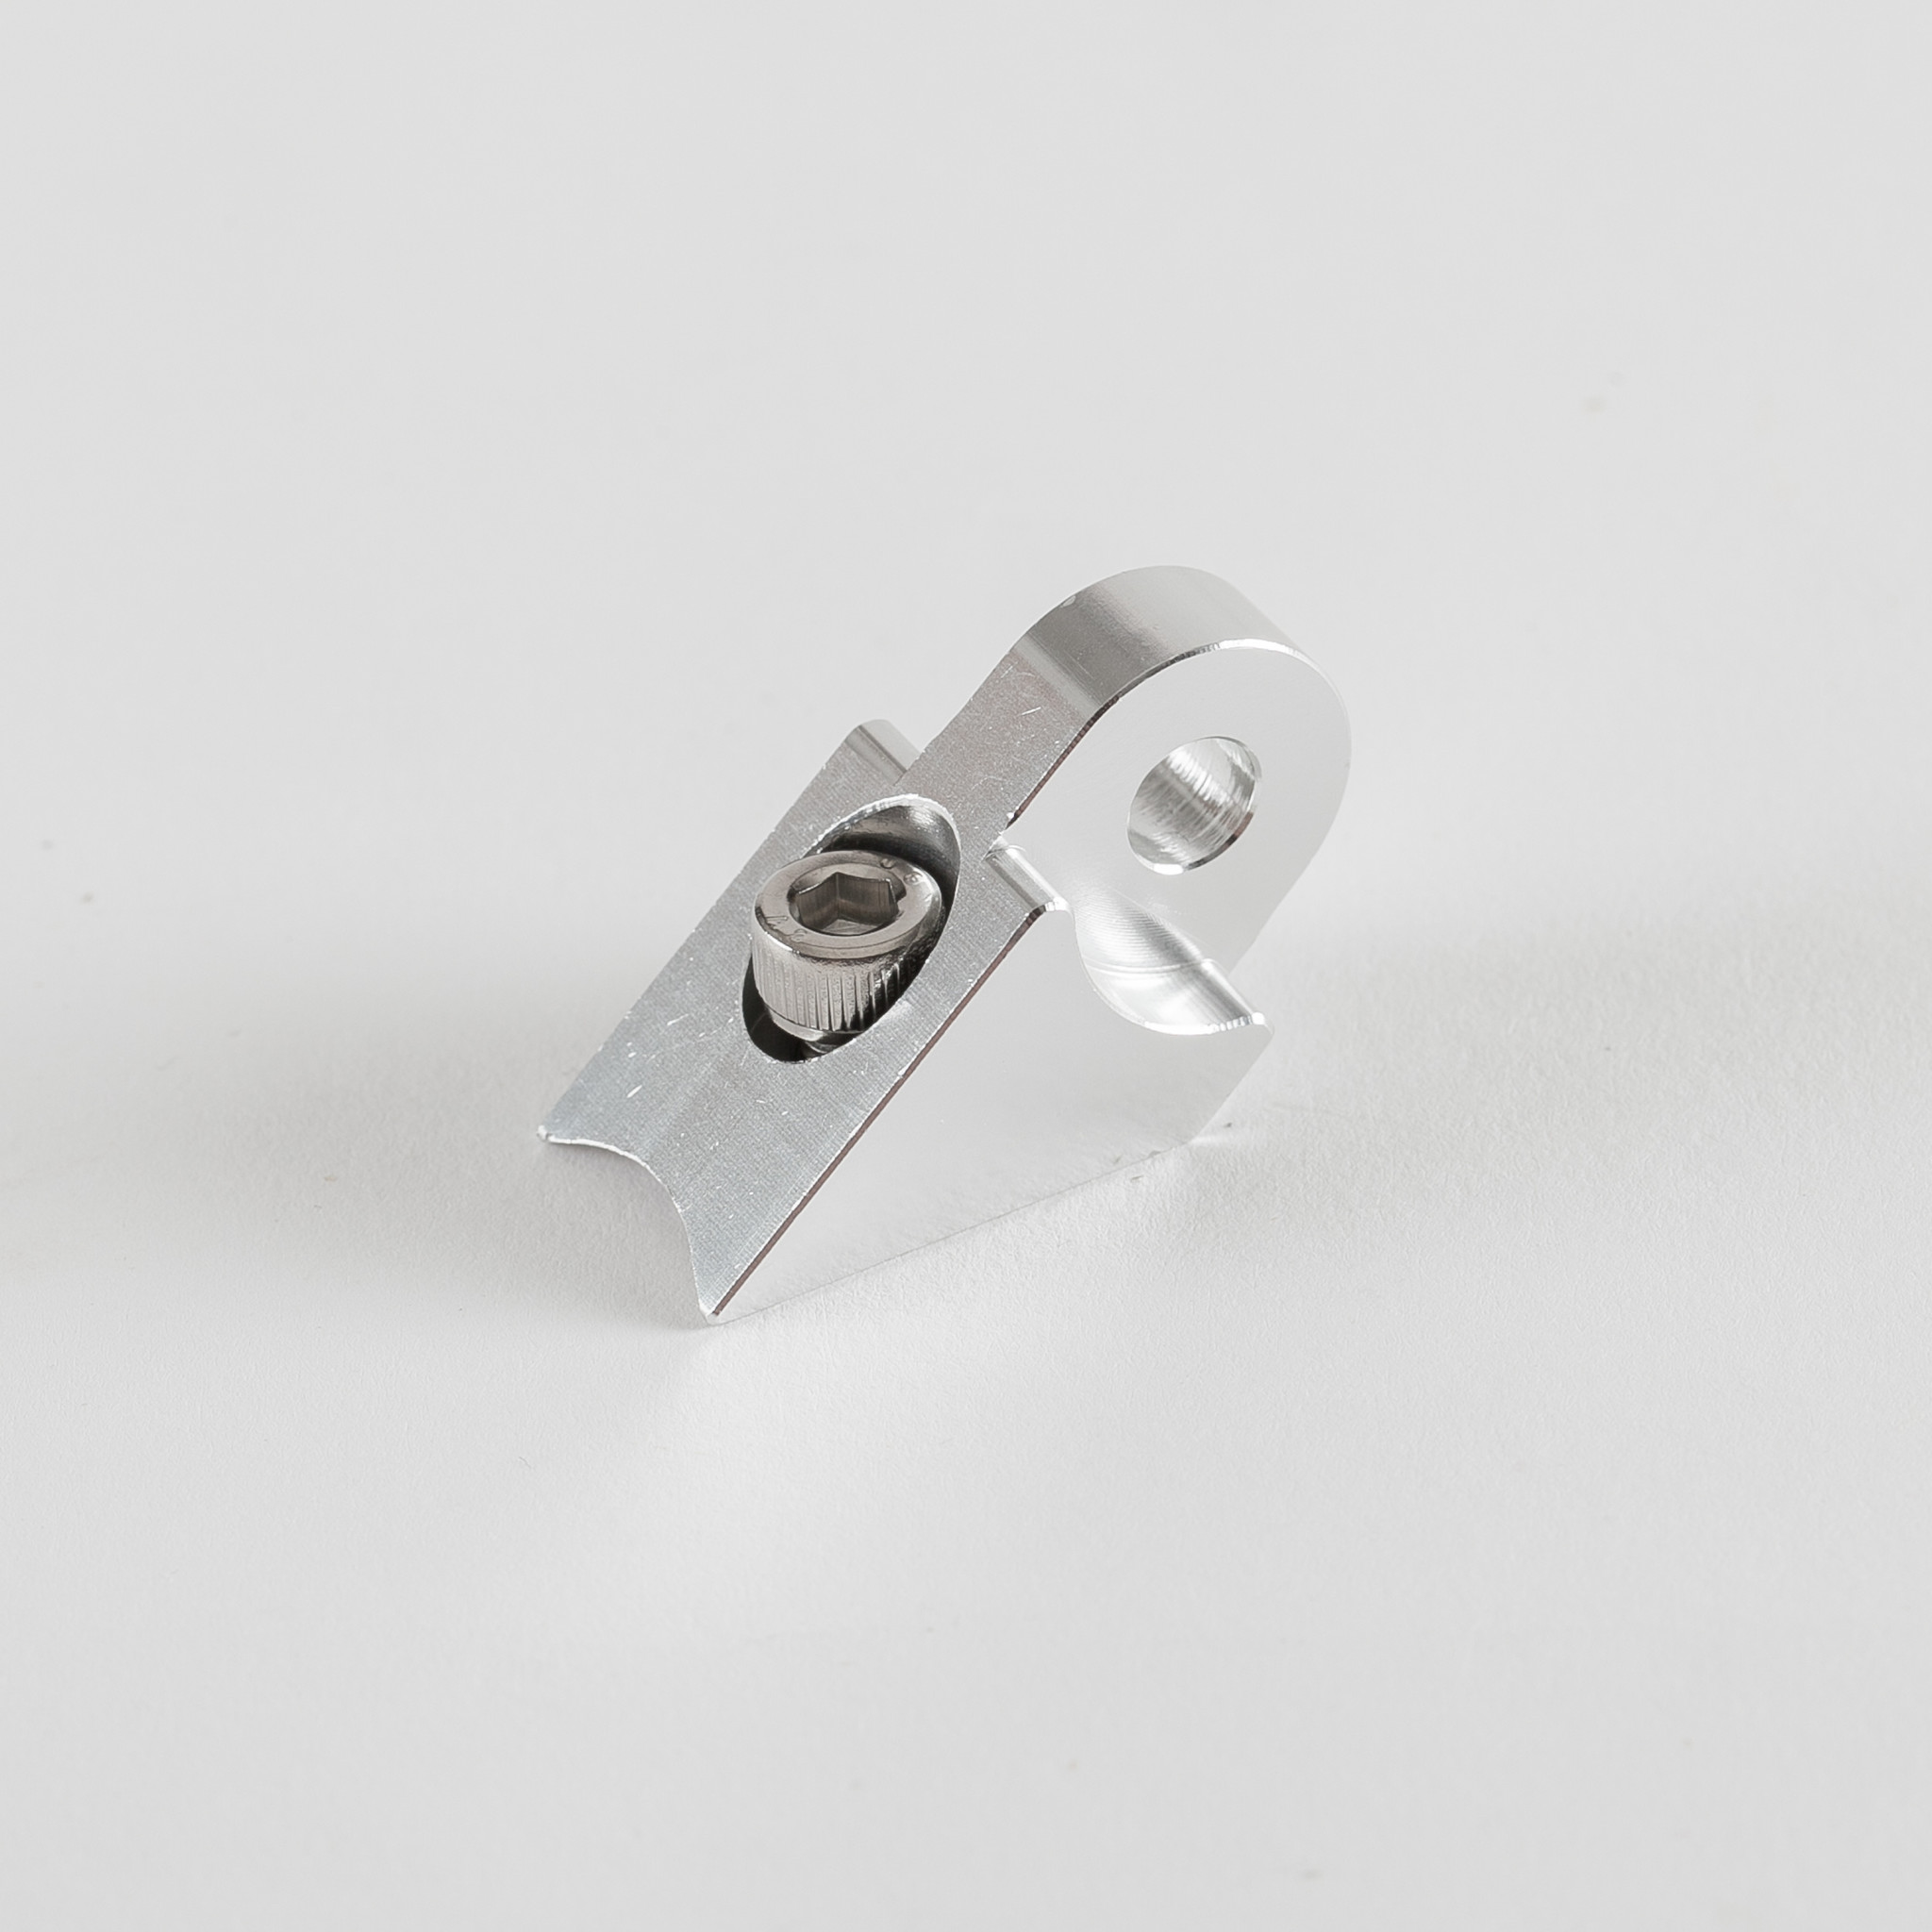 Rindow RINDOW - Light mount, CNC machined